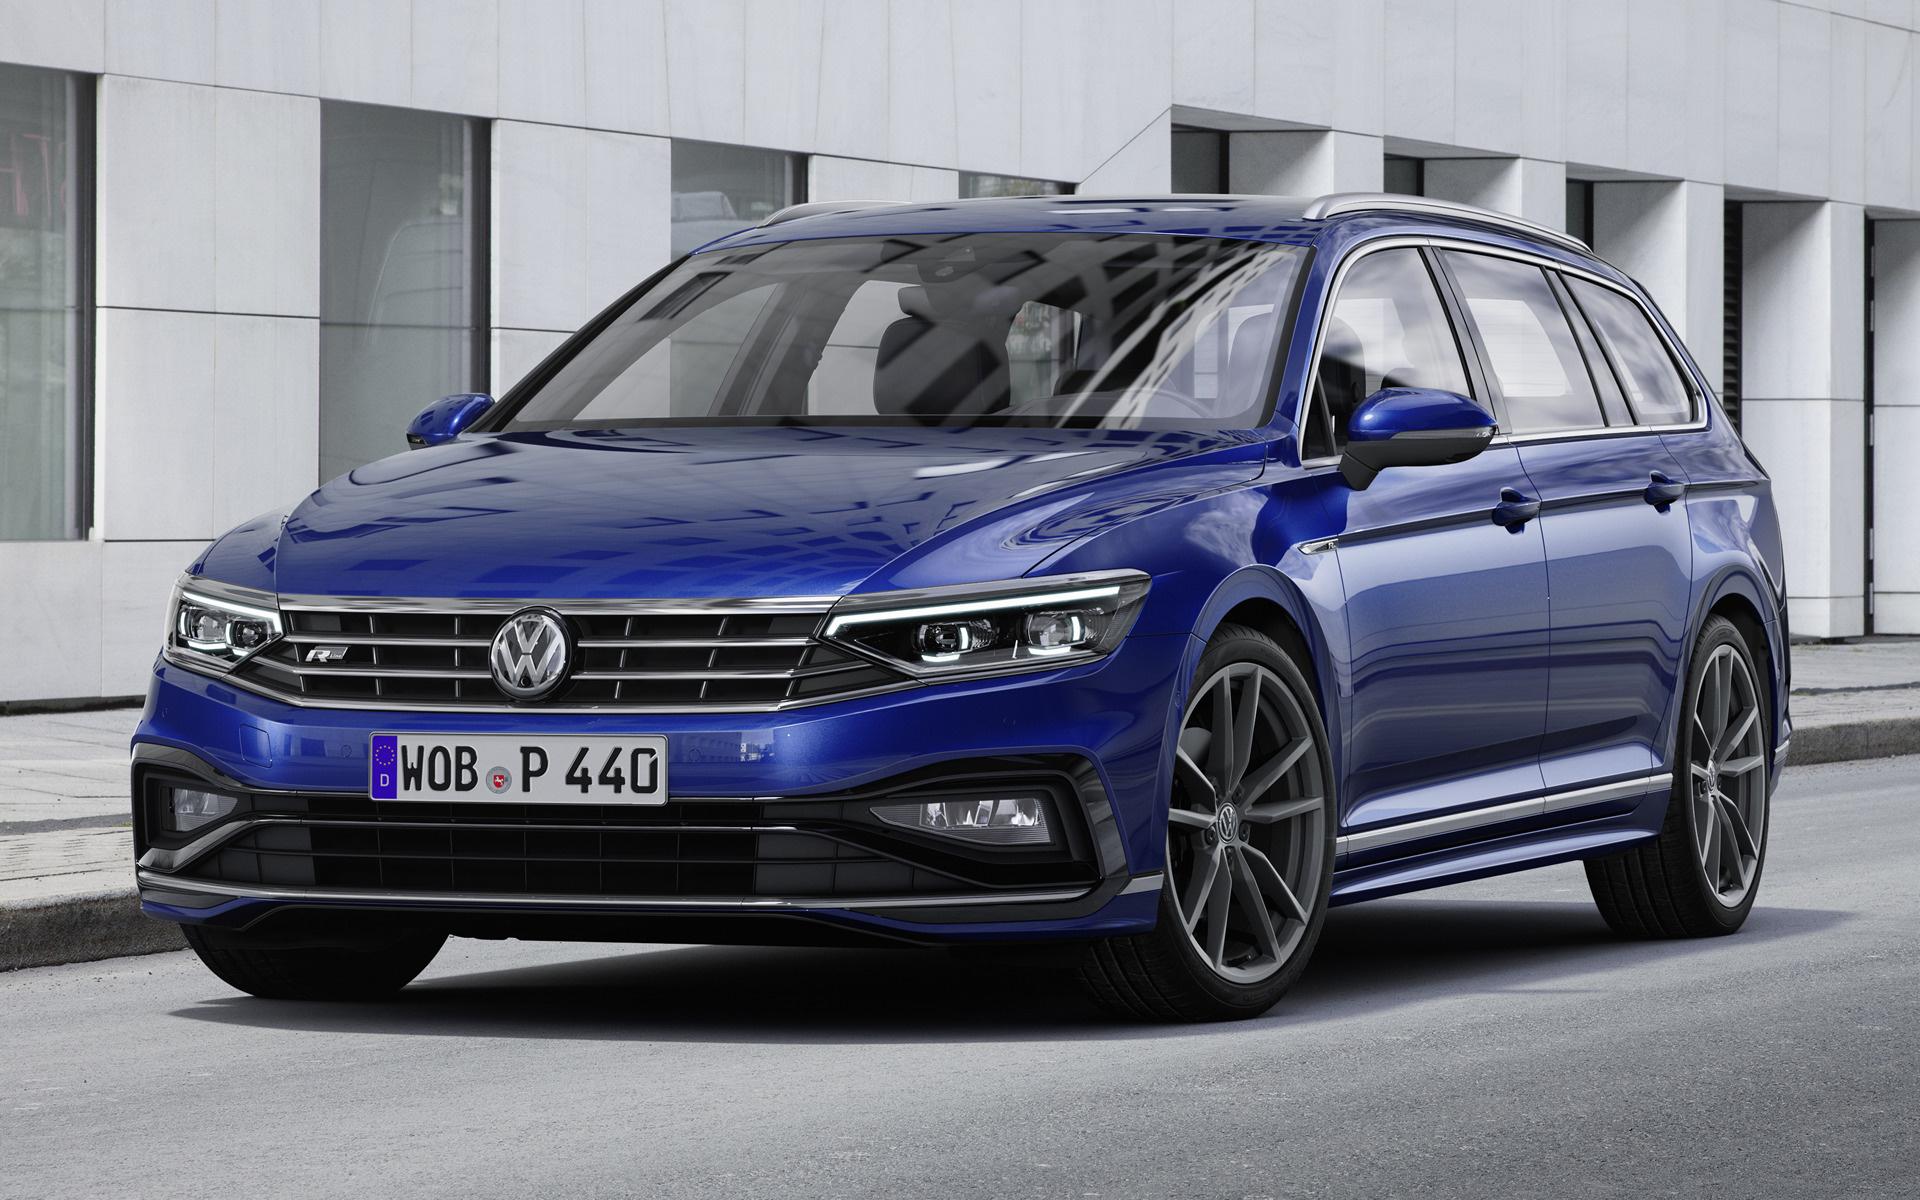 2019 Volkswagen Passat Variant R Line   Wallpapers and HD Images 1920x1200